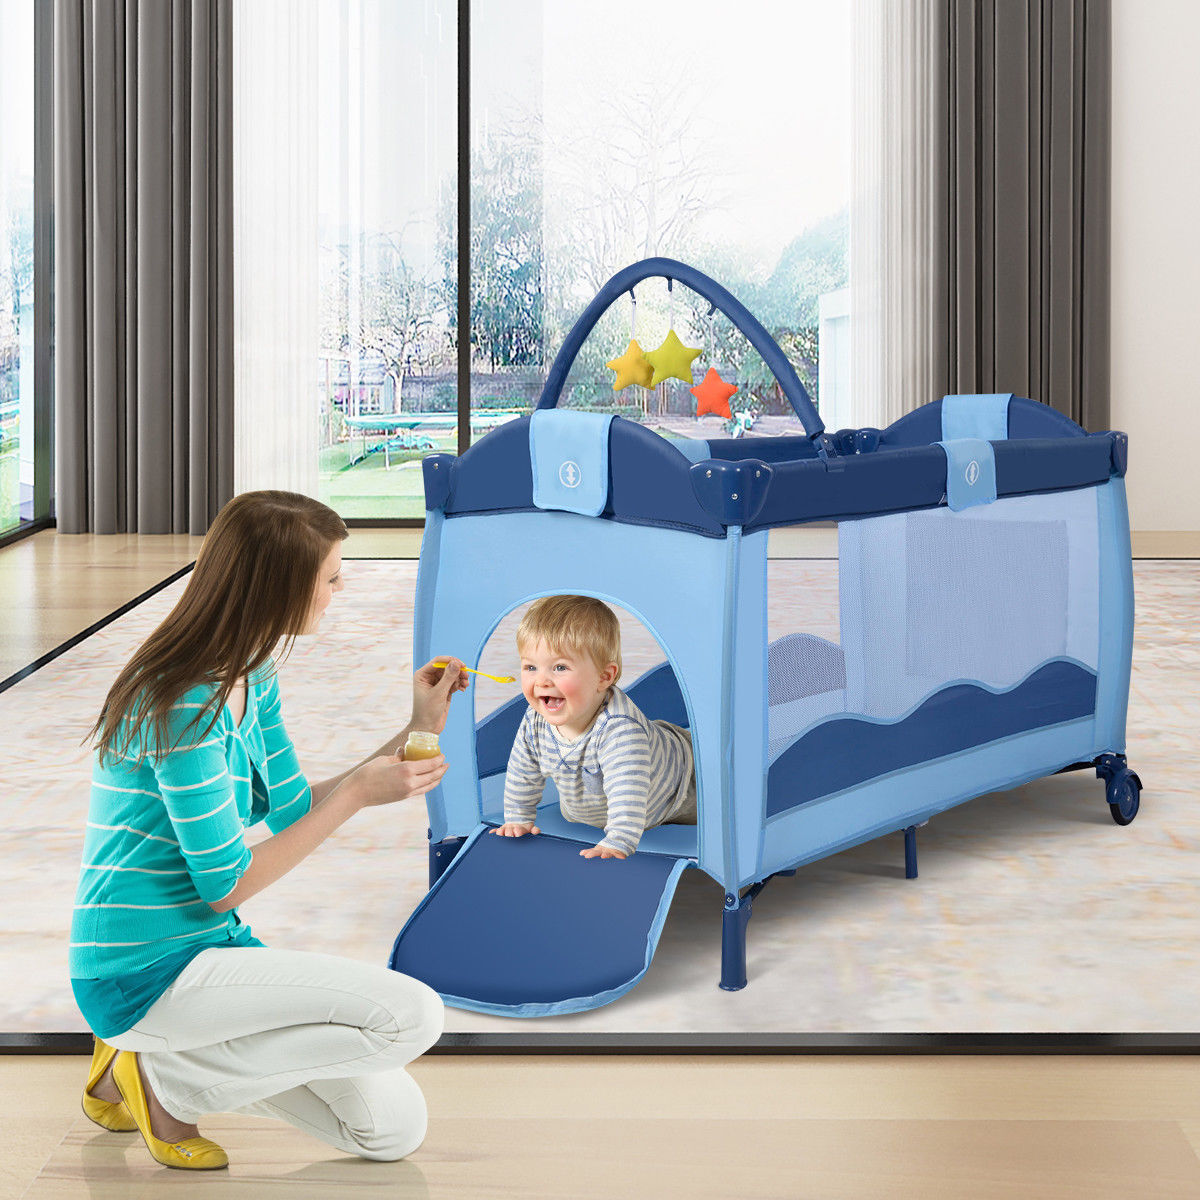 Foldable Baby Crib Playpen Playard Pack Travel Infant ...